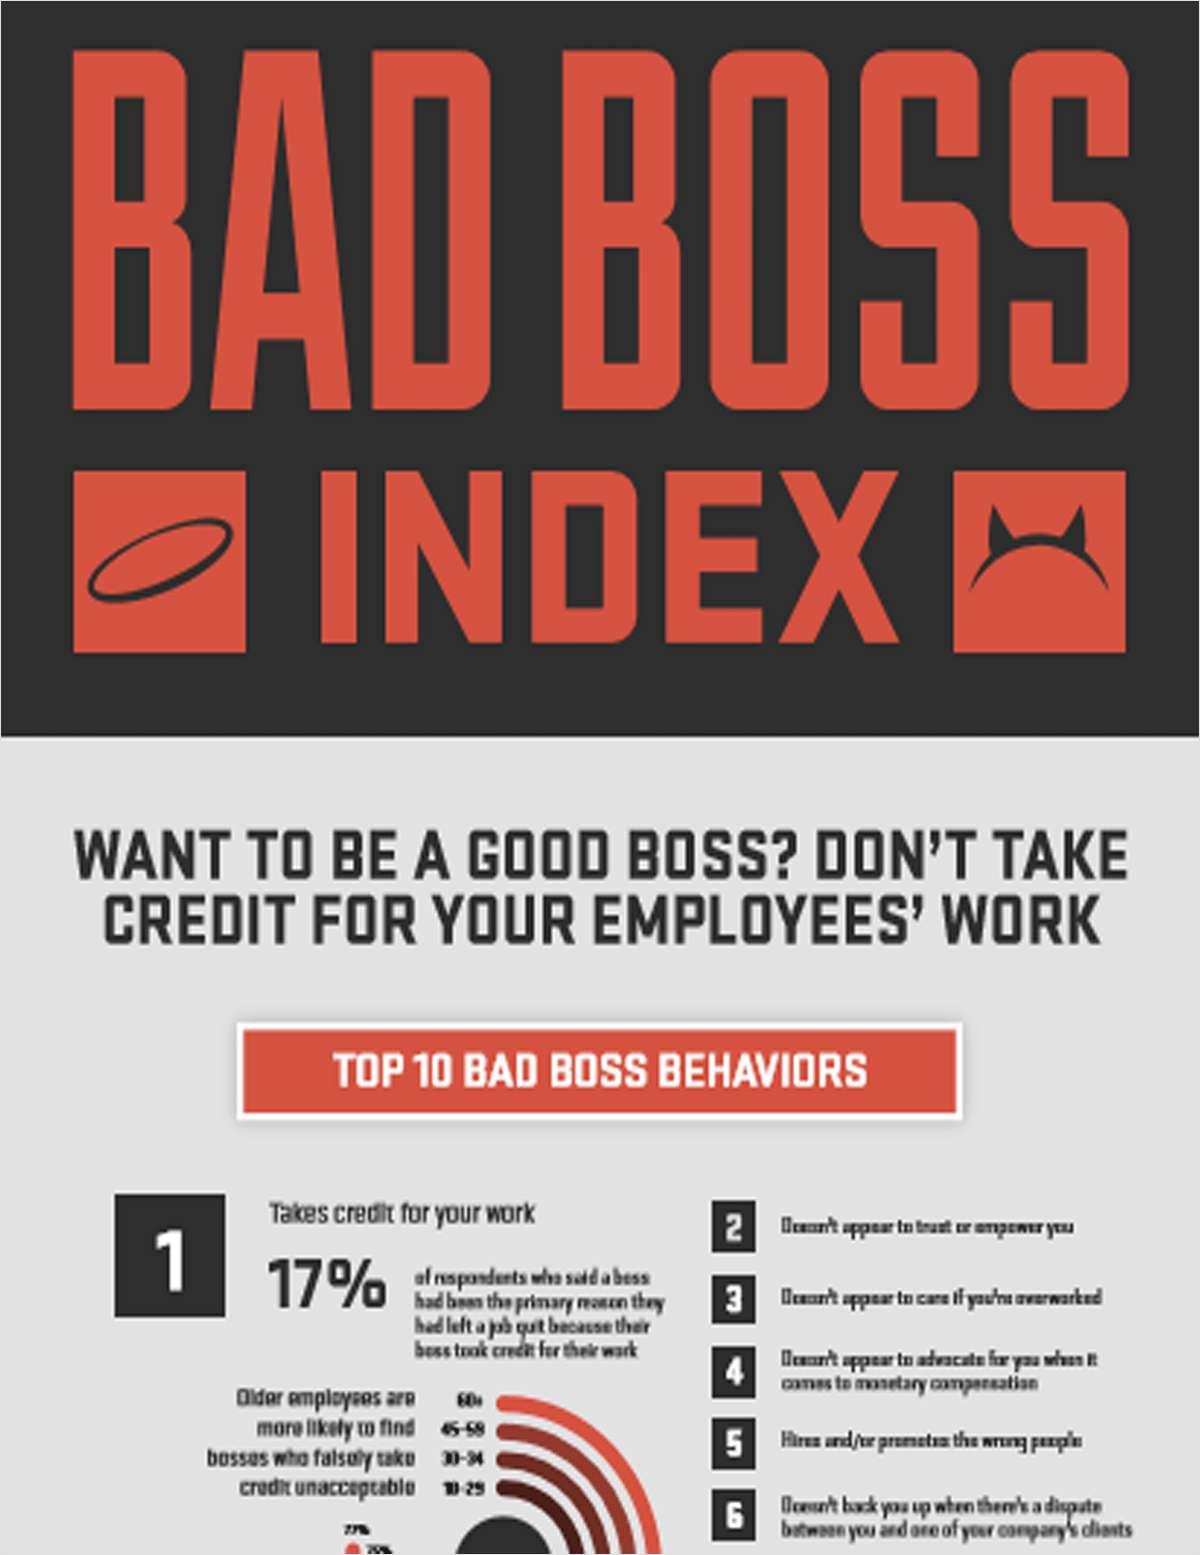 Bad Boss Index